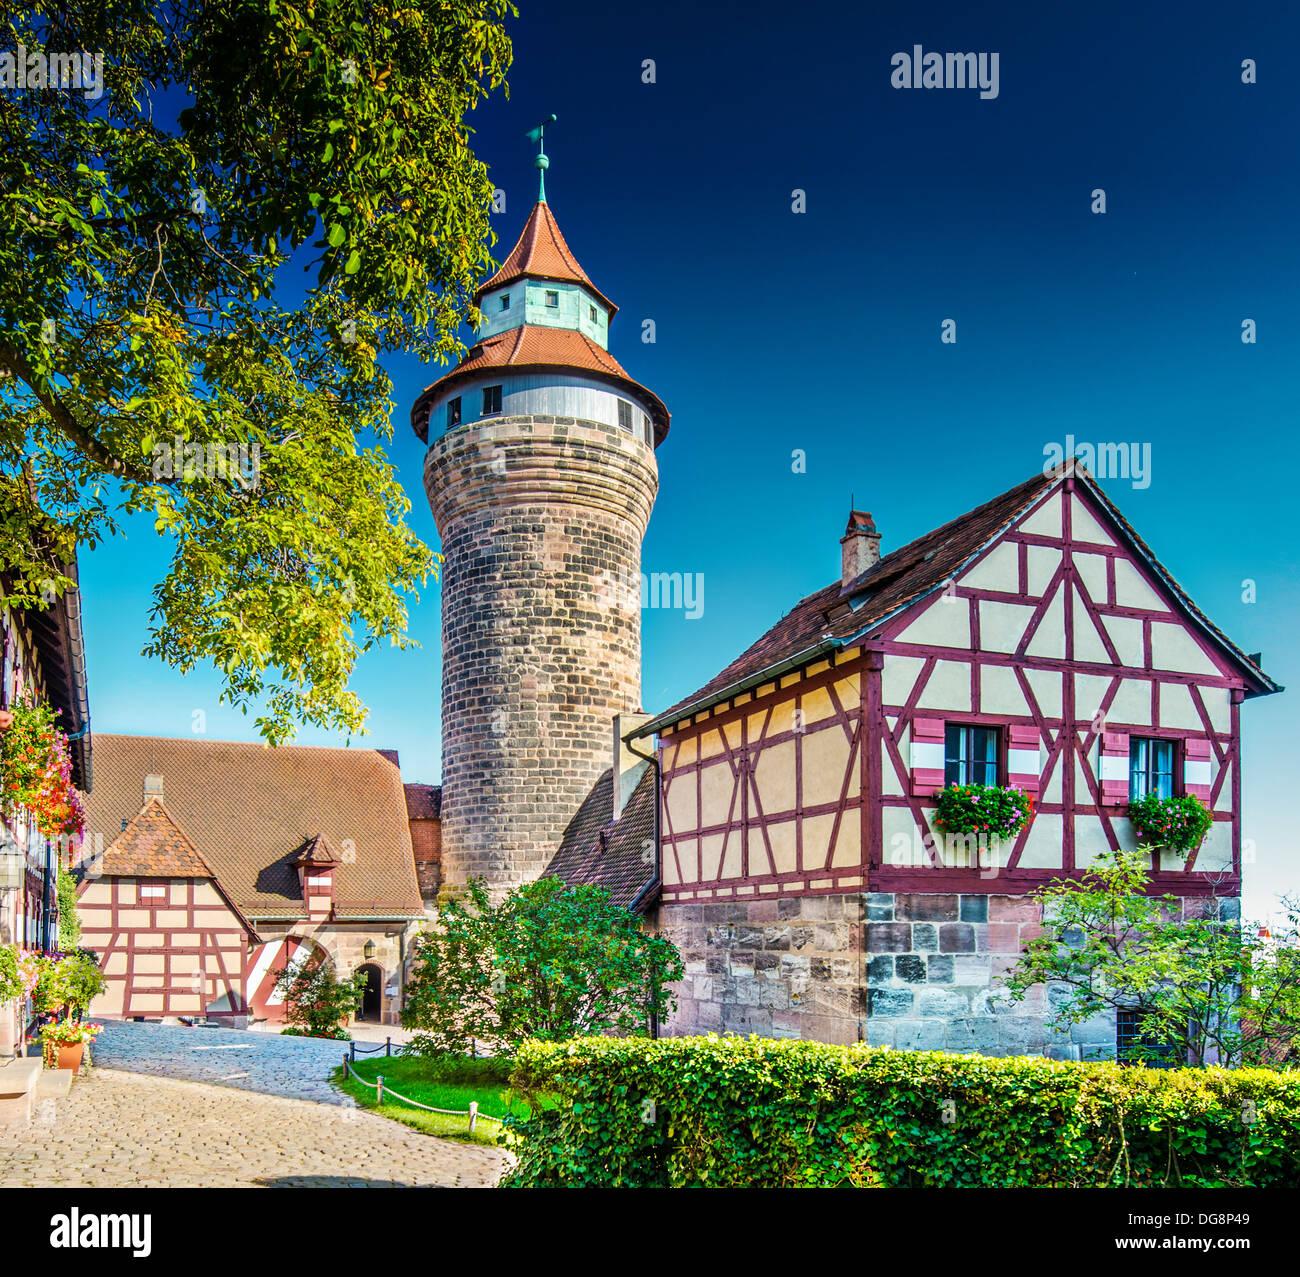 Nuremberg Castle Nuremberg, Germany. - Stock Image